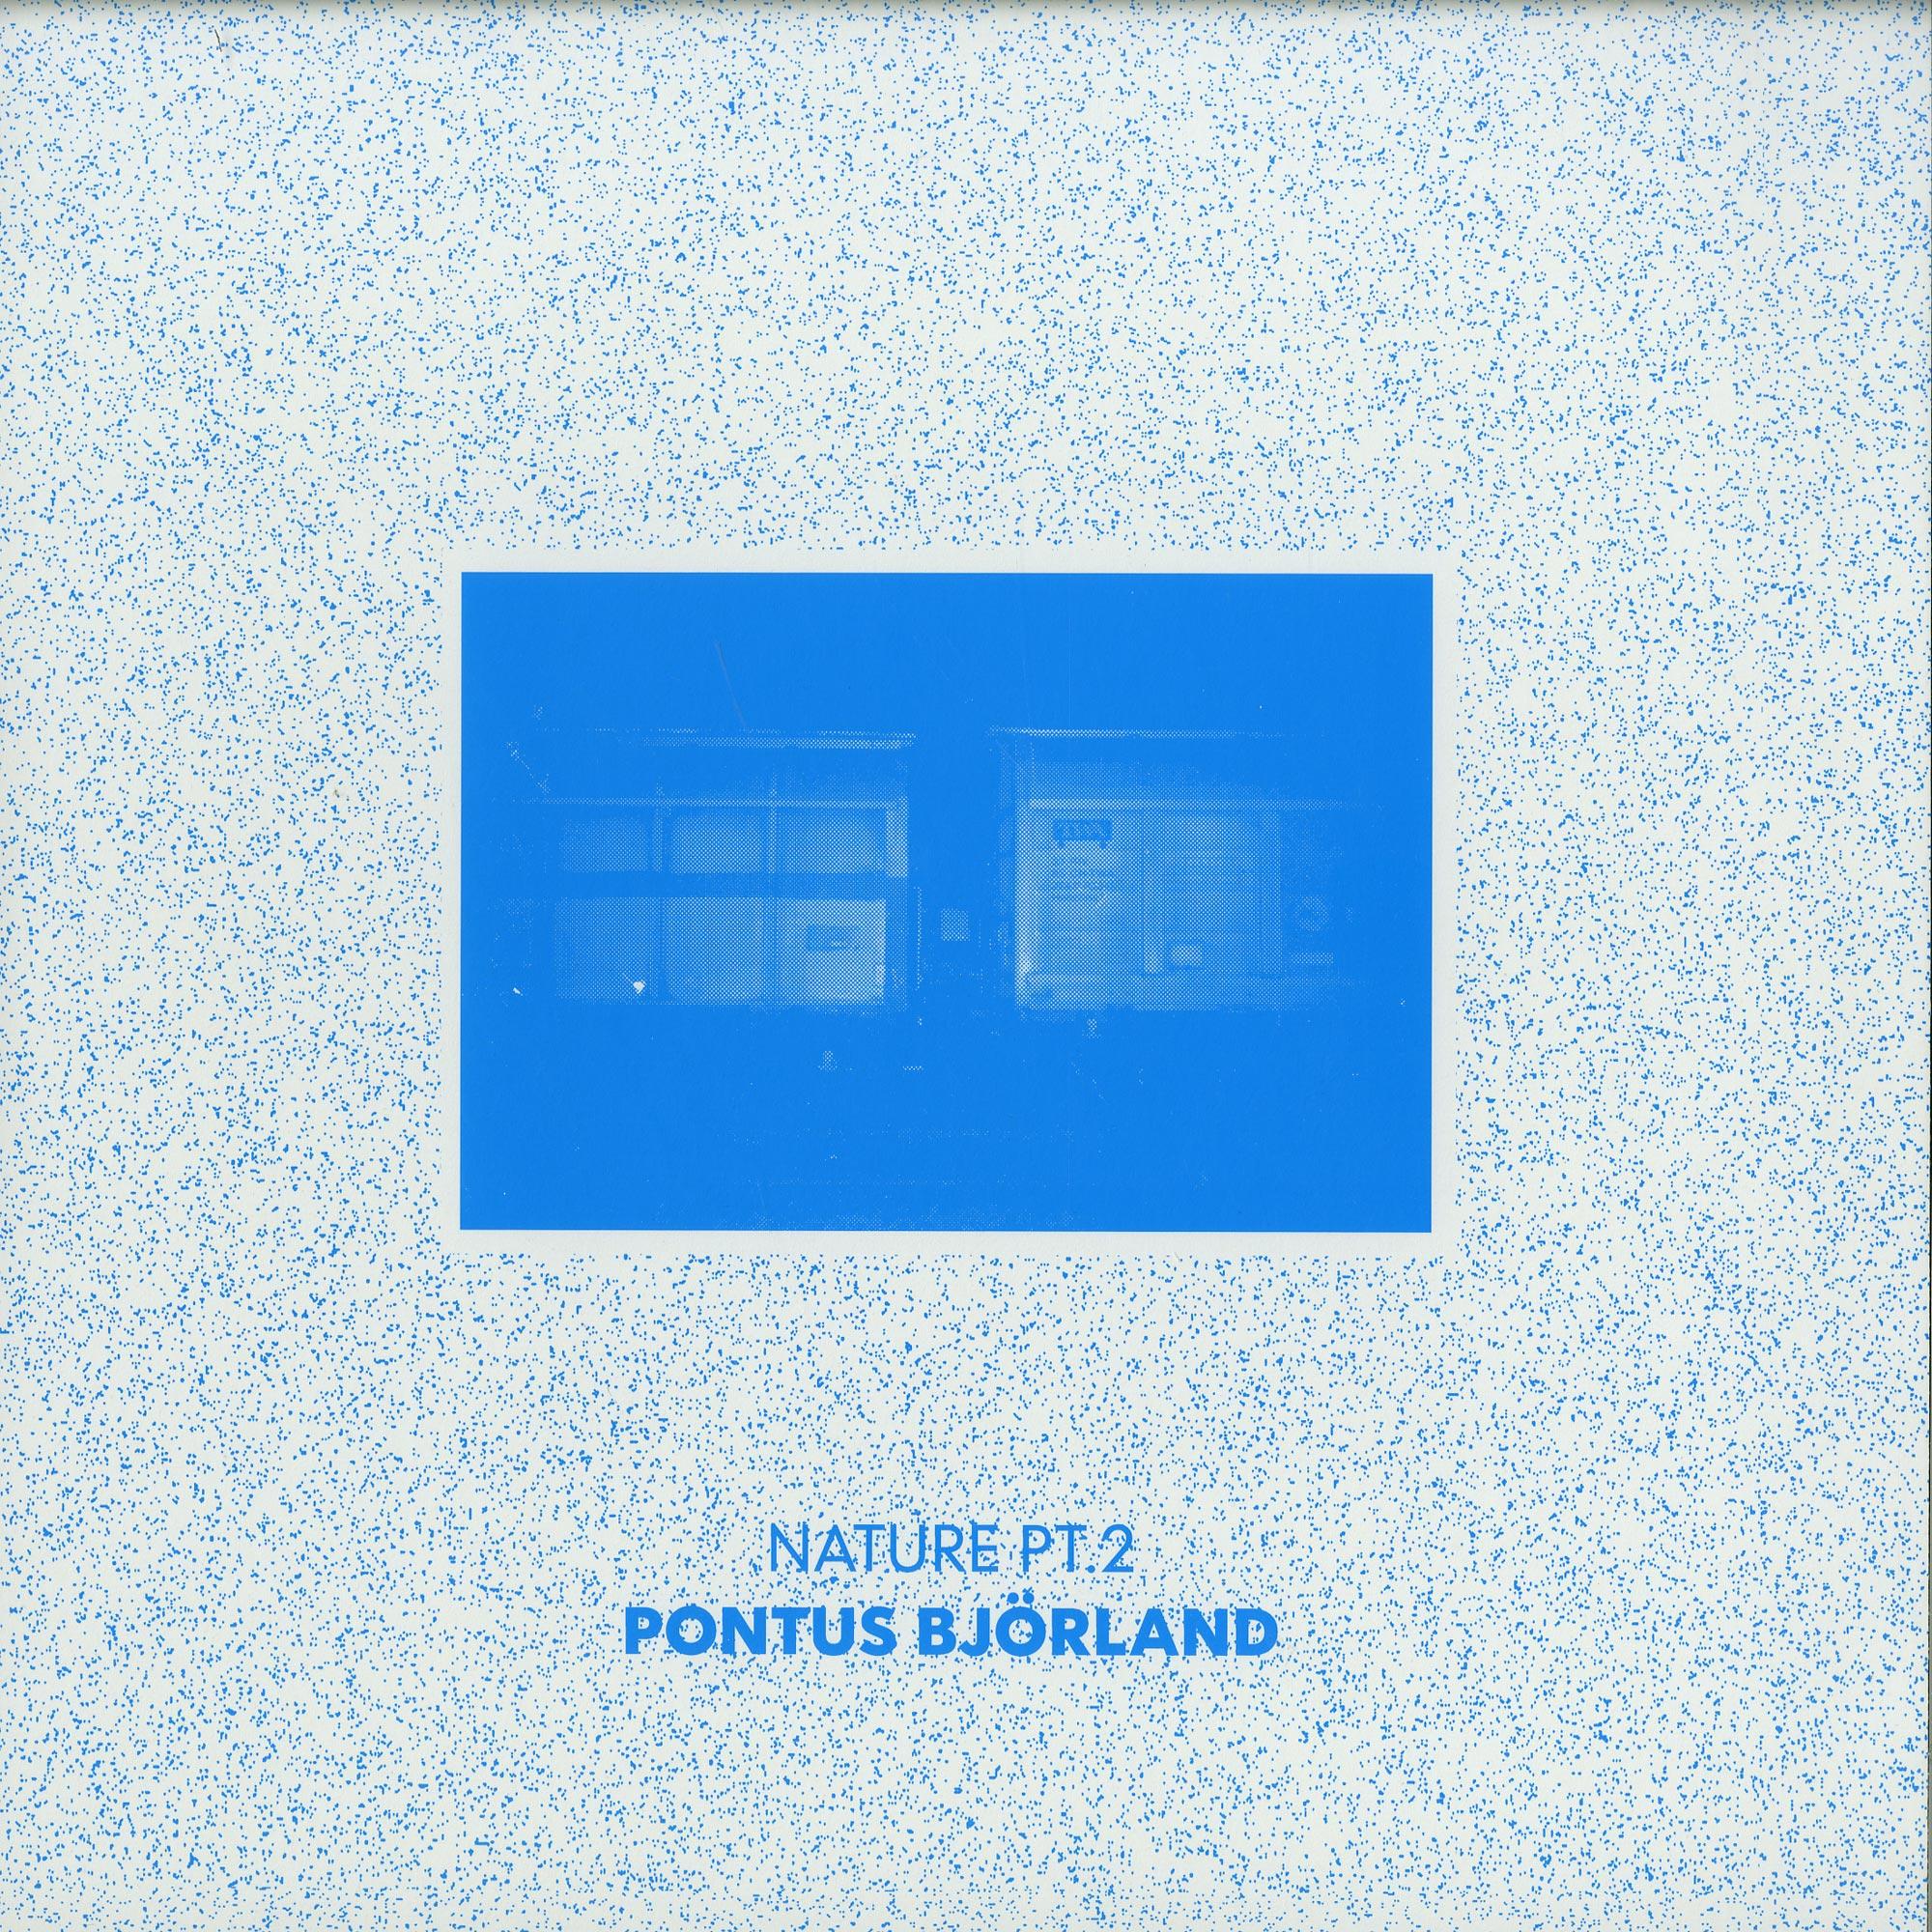 Pontus Bjoerland - NATURE PT. 2